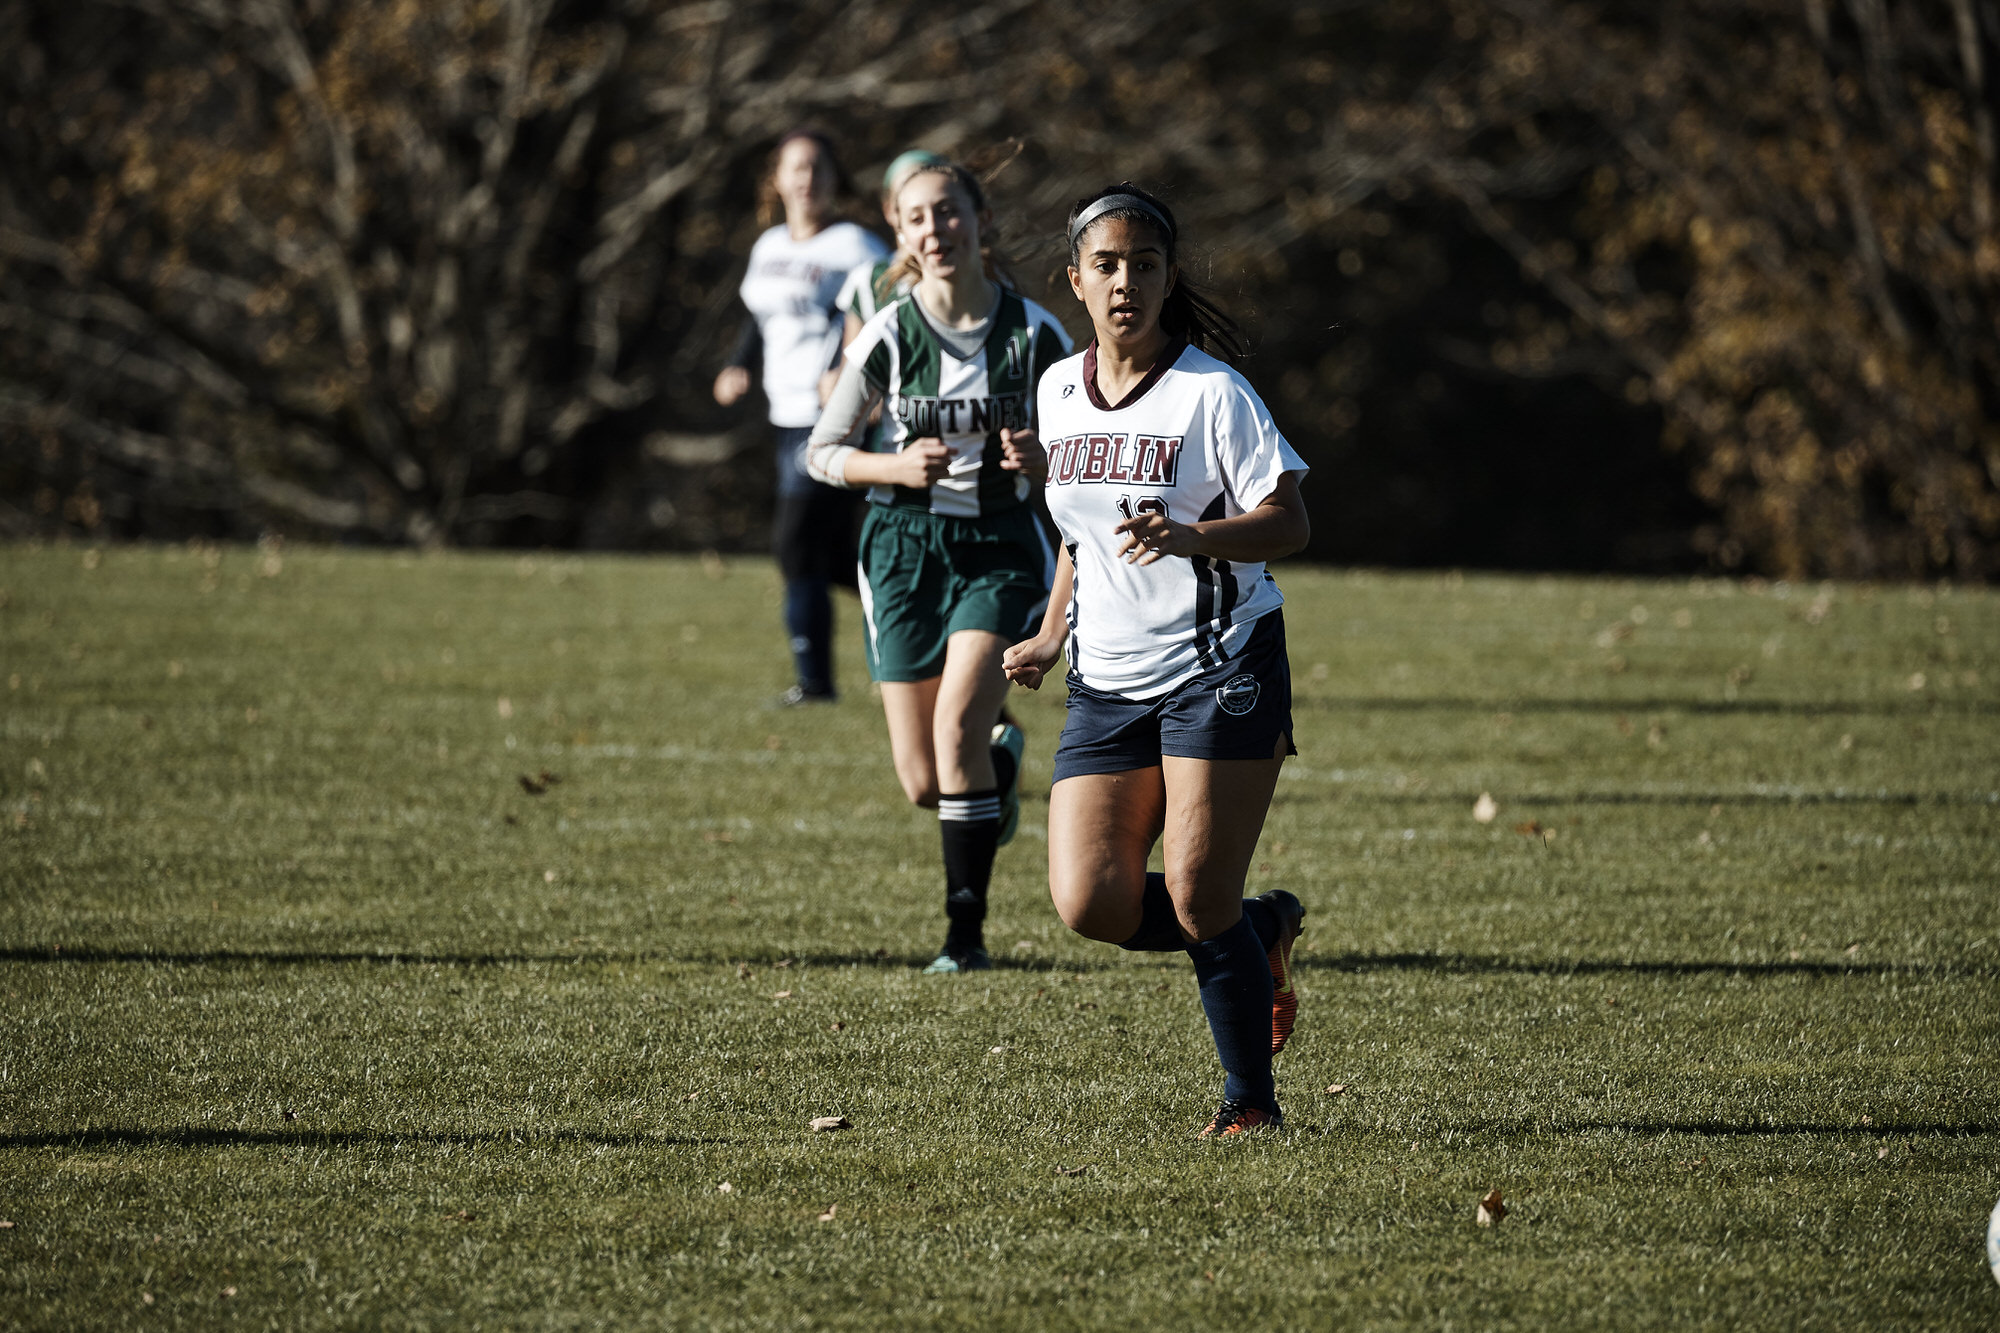 Girls Varsity Soccer vs. Putney School - October 26, 2018 - 001.jpg